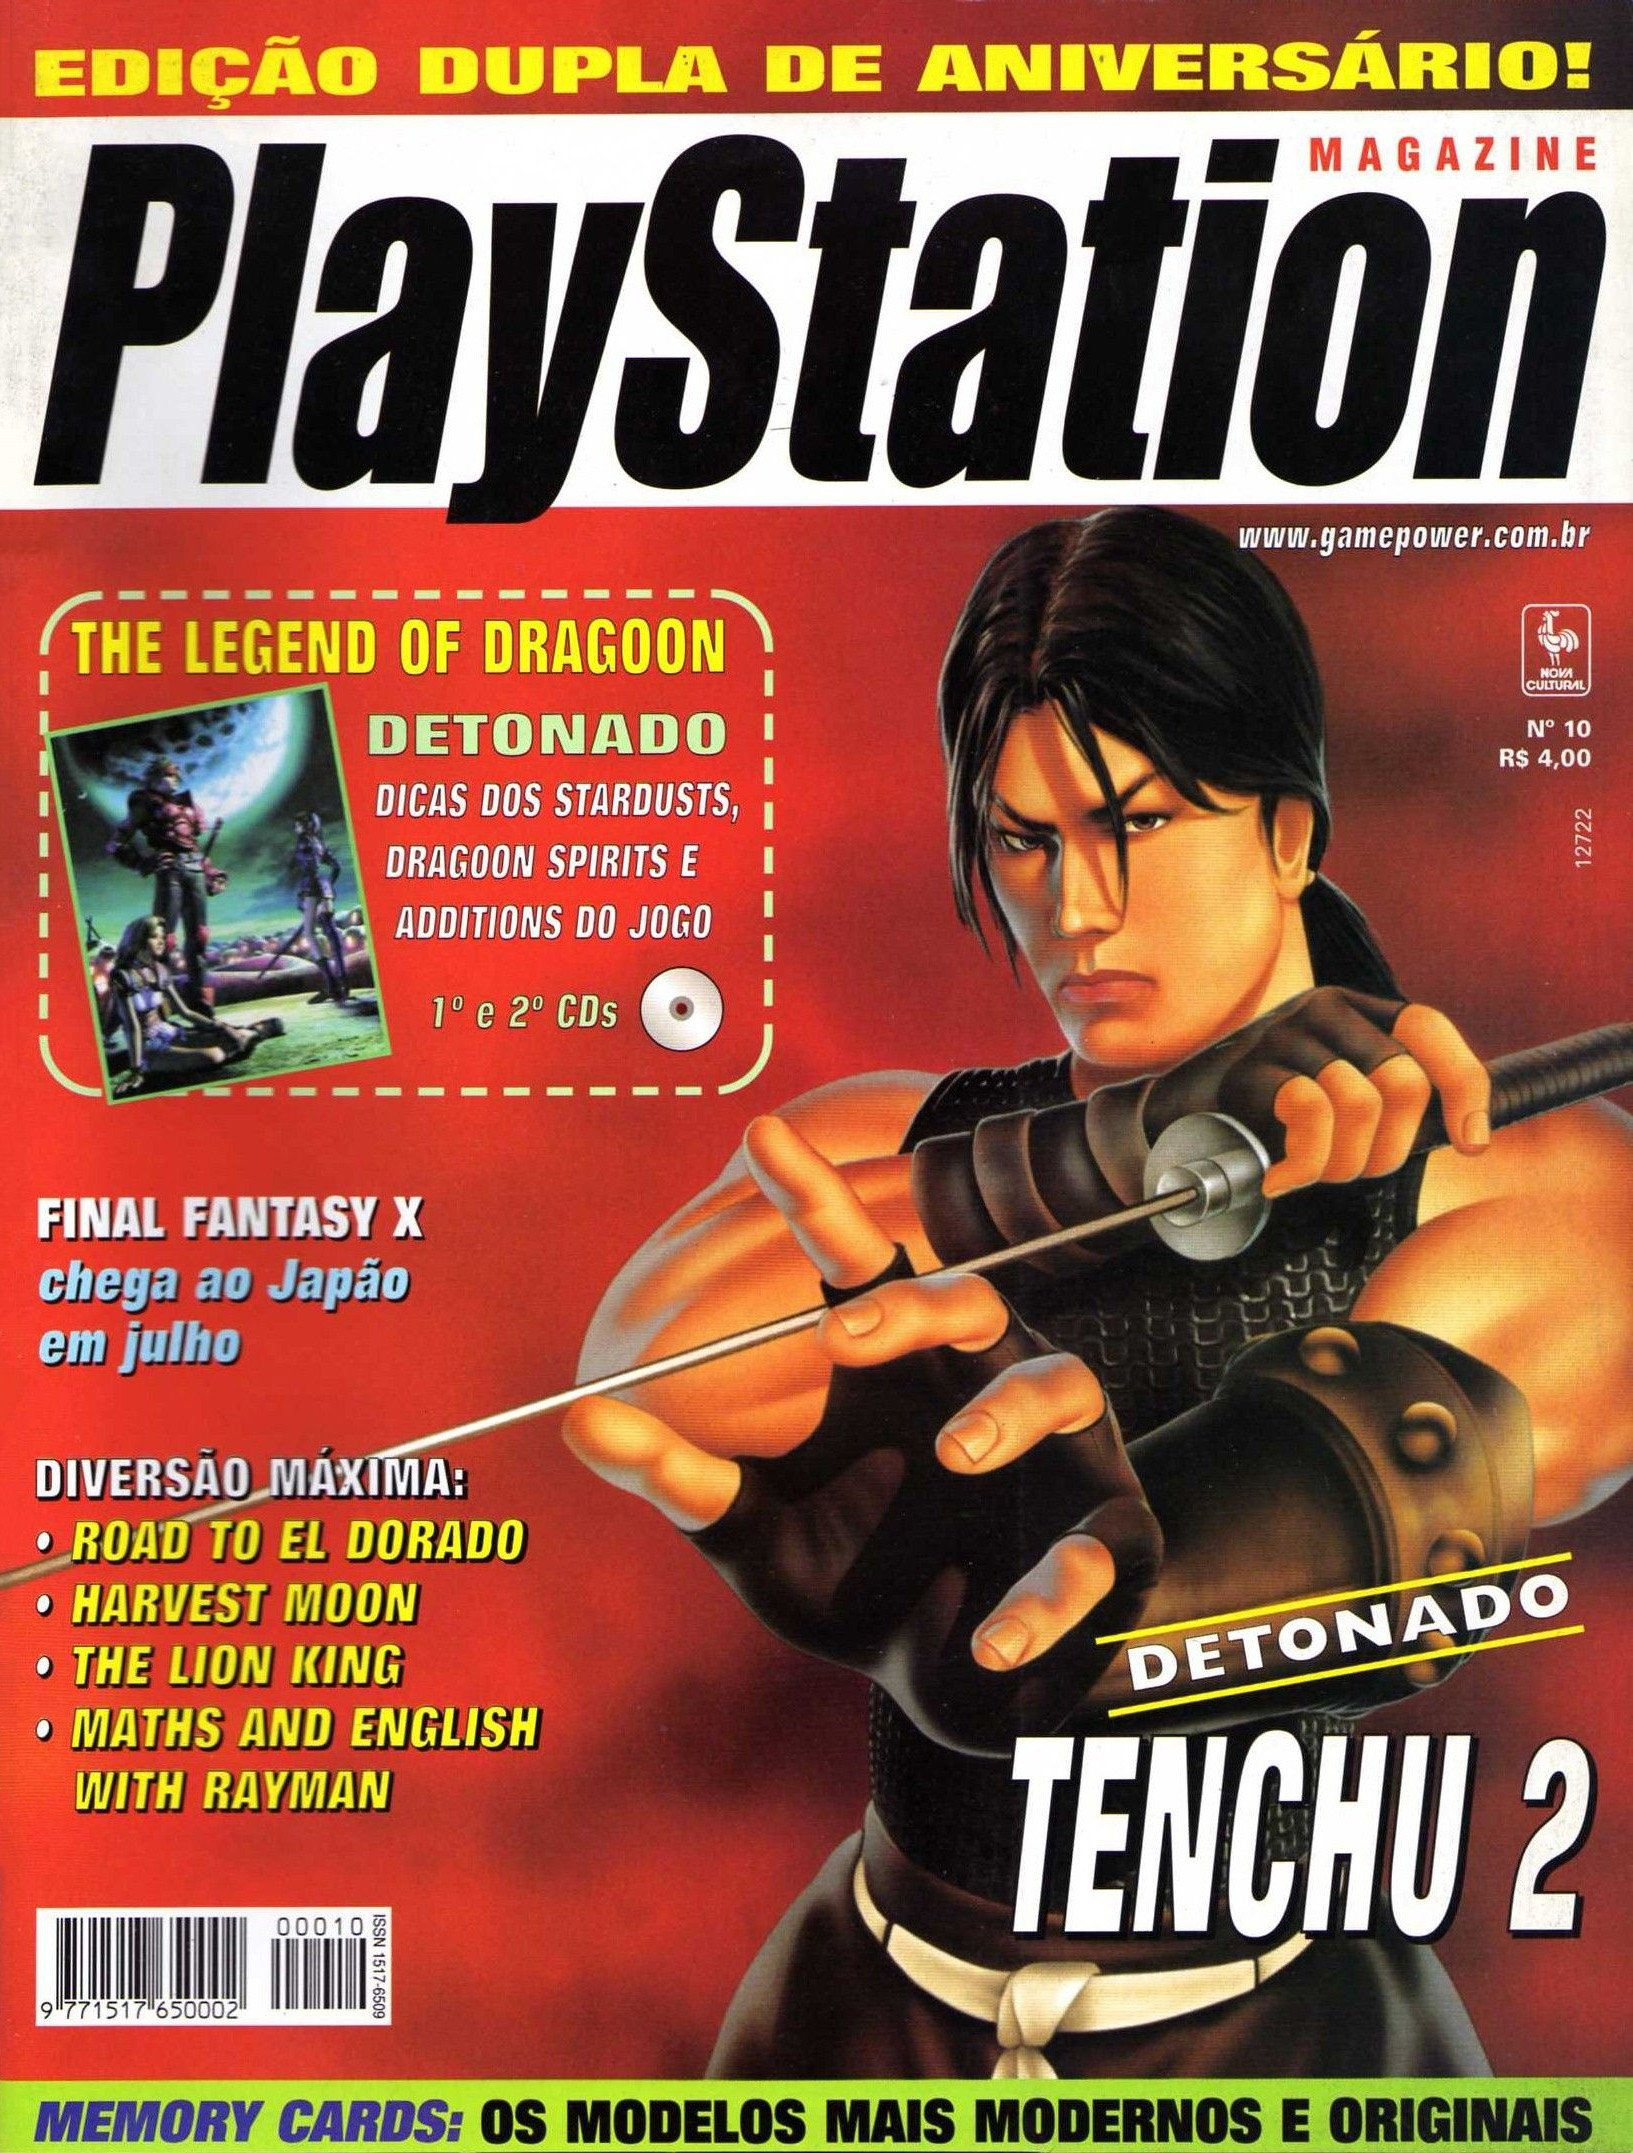 SGP Playstation Magazine Issue 10 (February 2001)